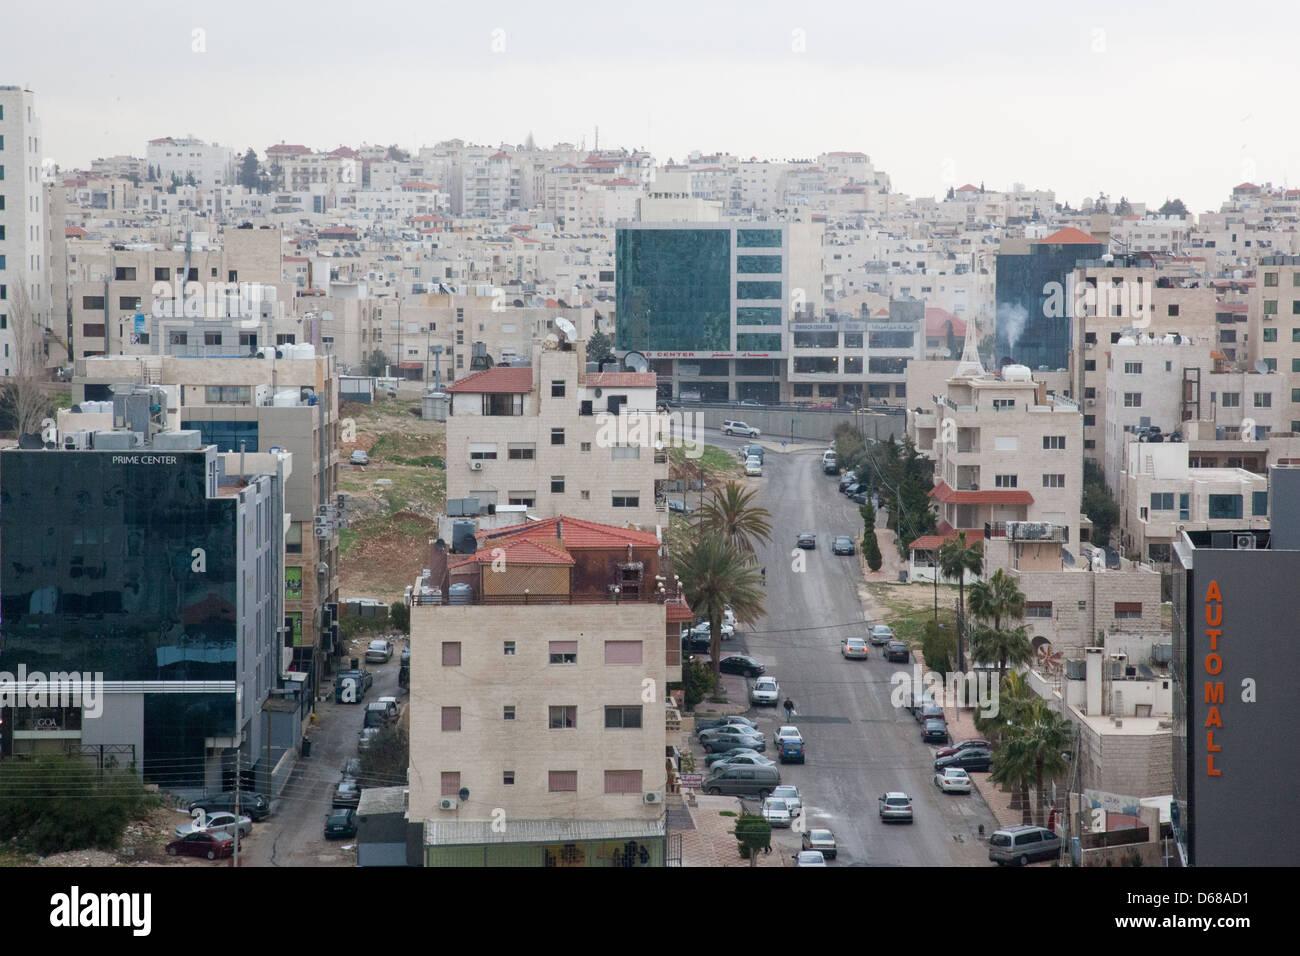 capital city of jordan country